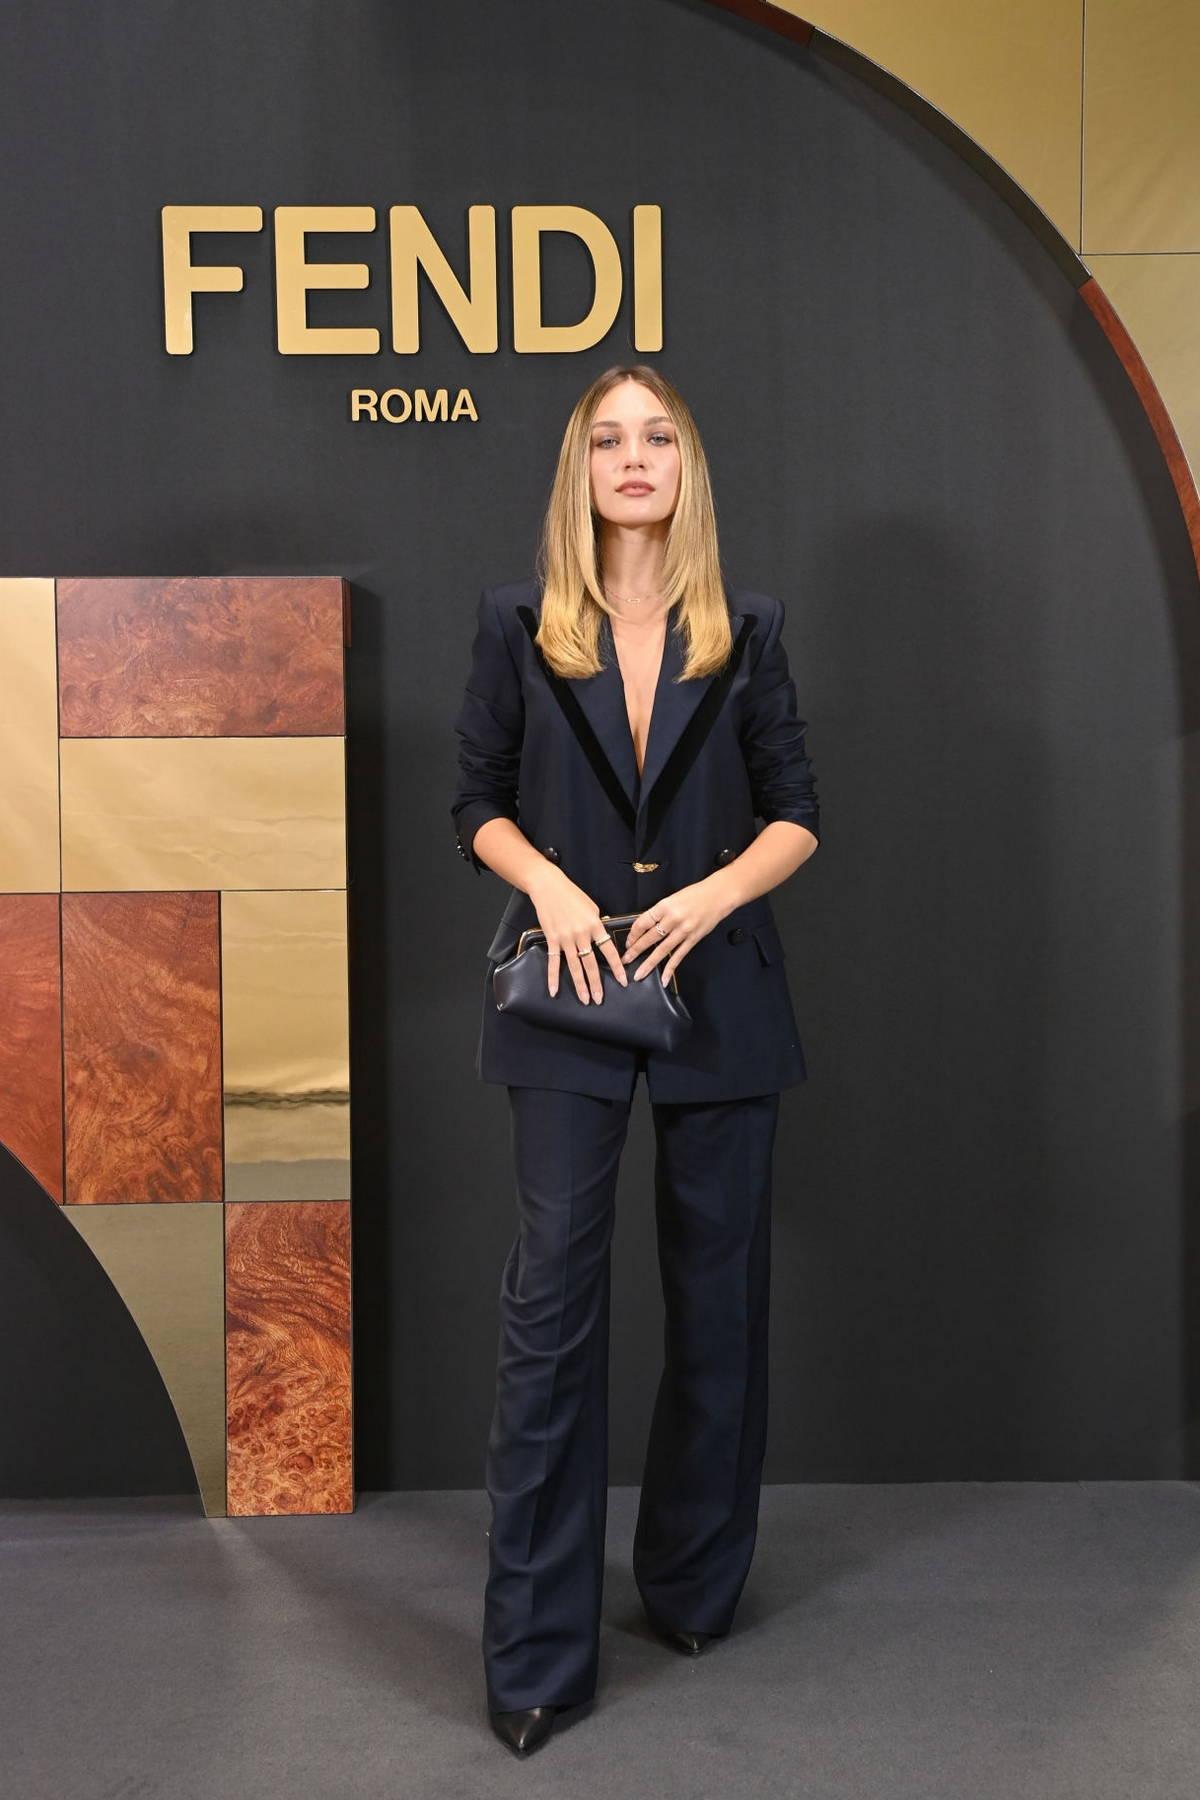 Maddie Ziegler attends Fendi Spring 2022 fashion show during Milan Fashion Week in Milan, Italy